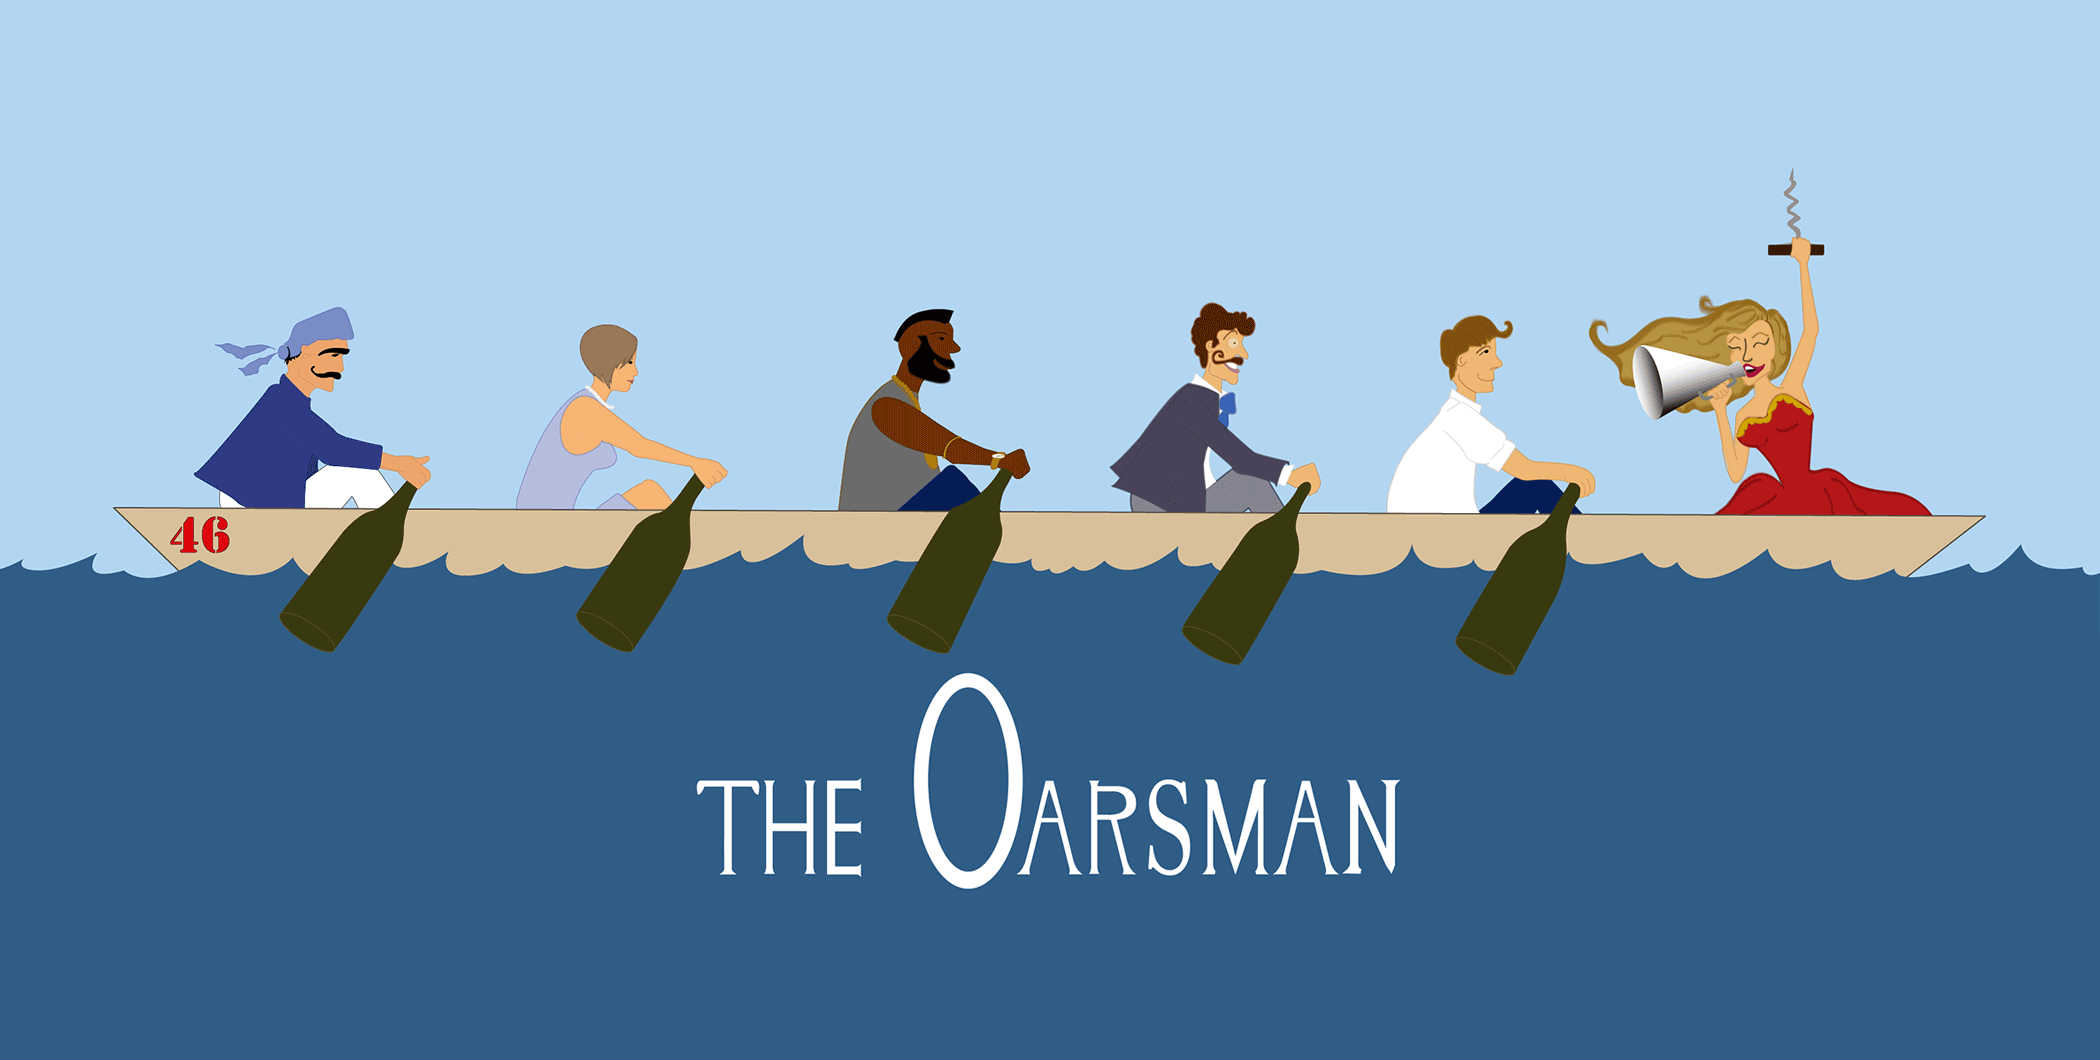 The Oarsman rowers illustration